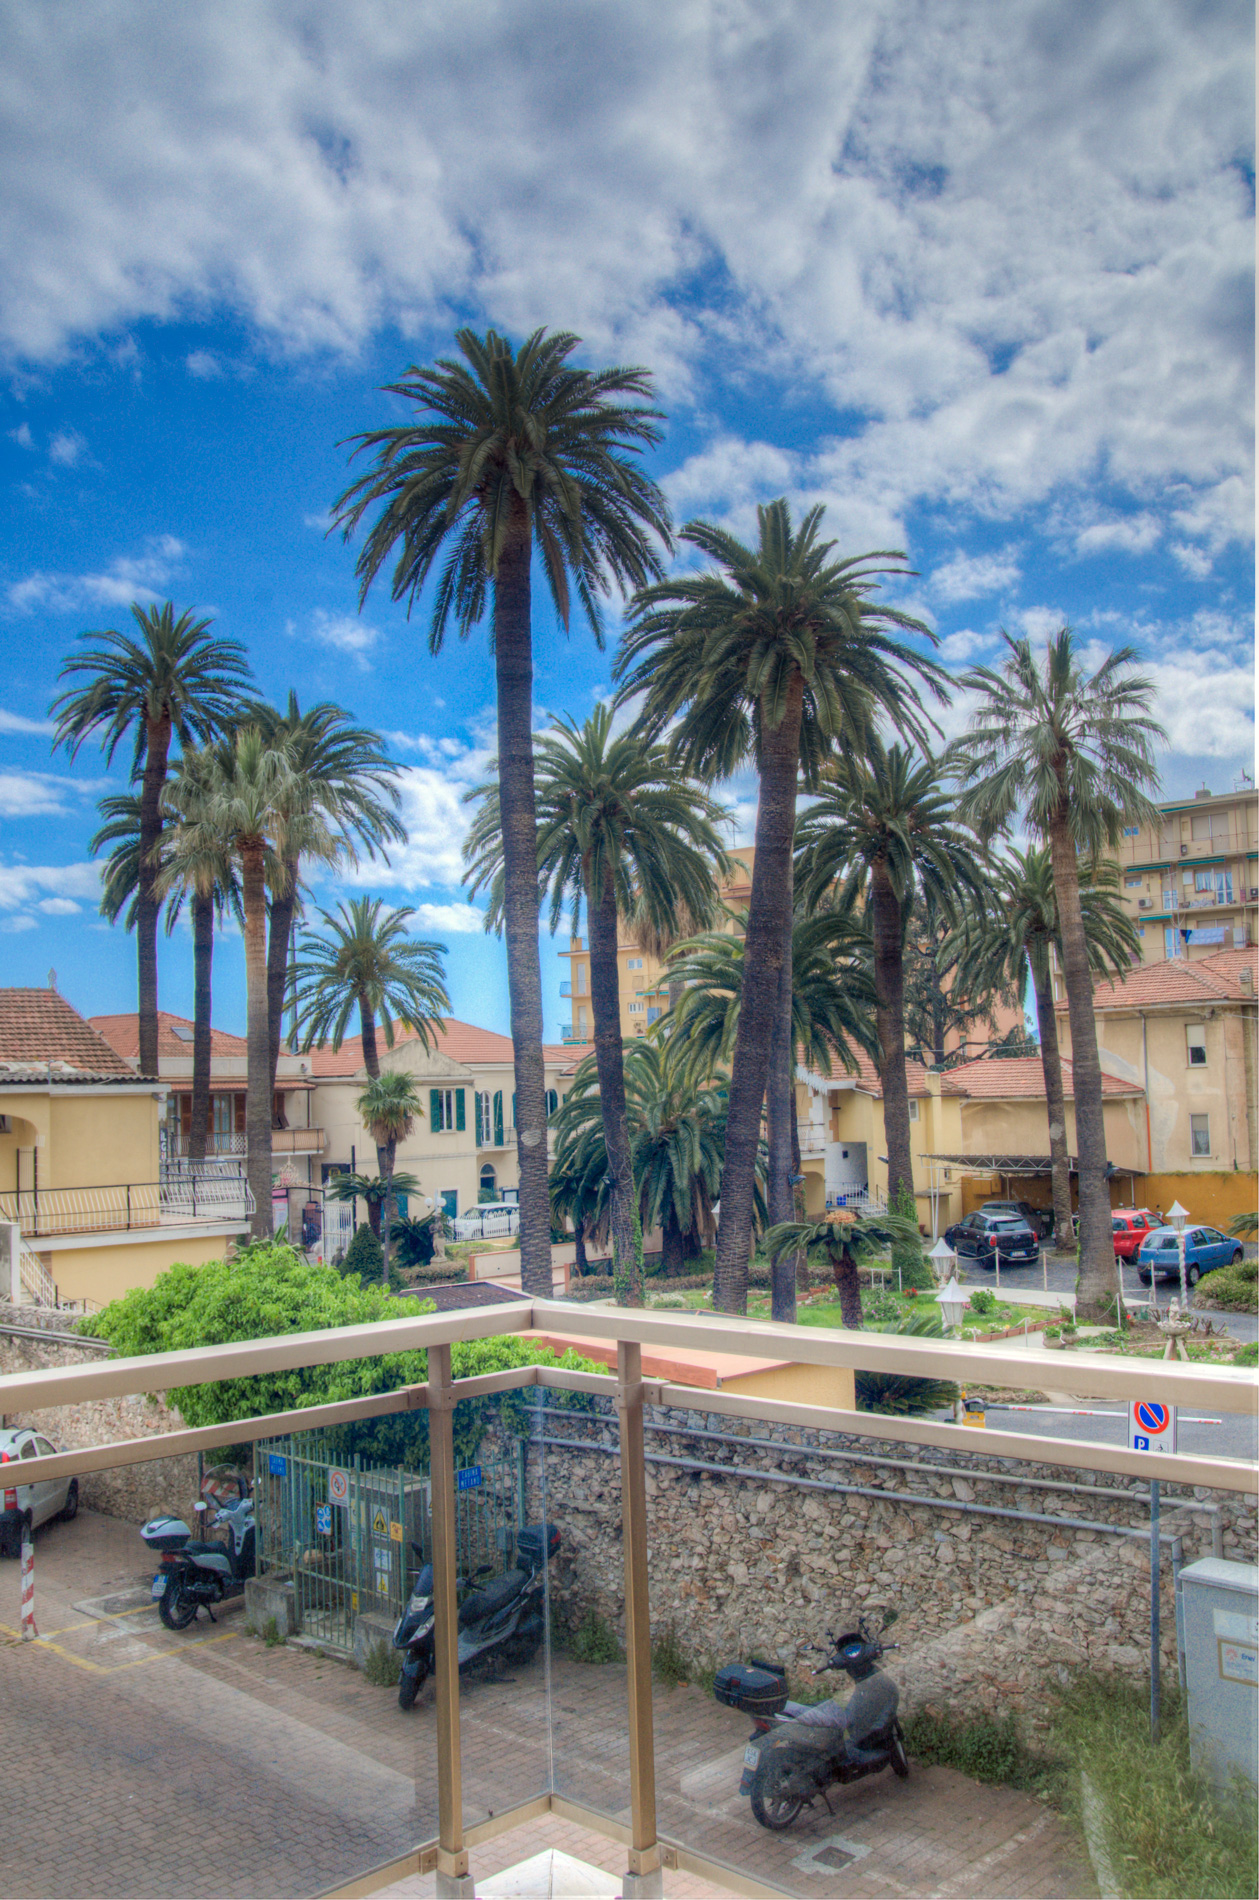 Bilocale Pietra Ligure Piazza Palmarini 7